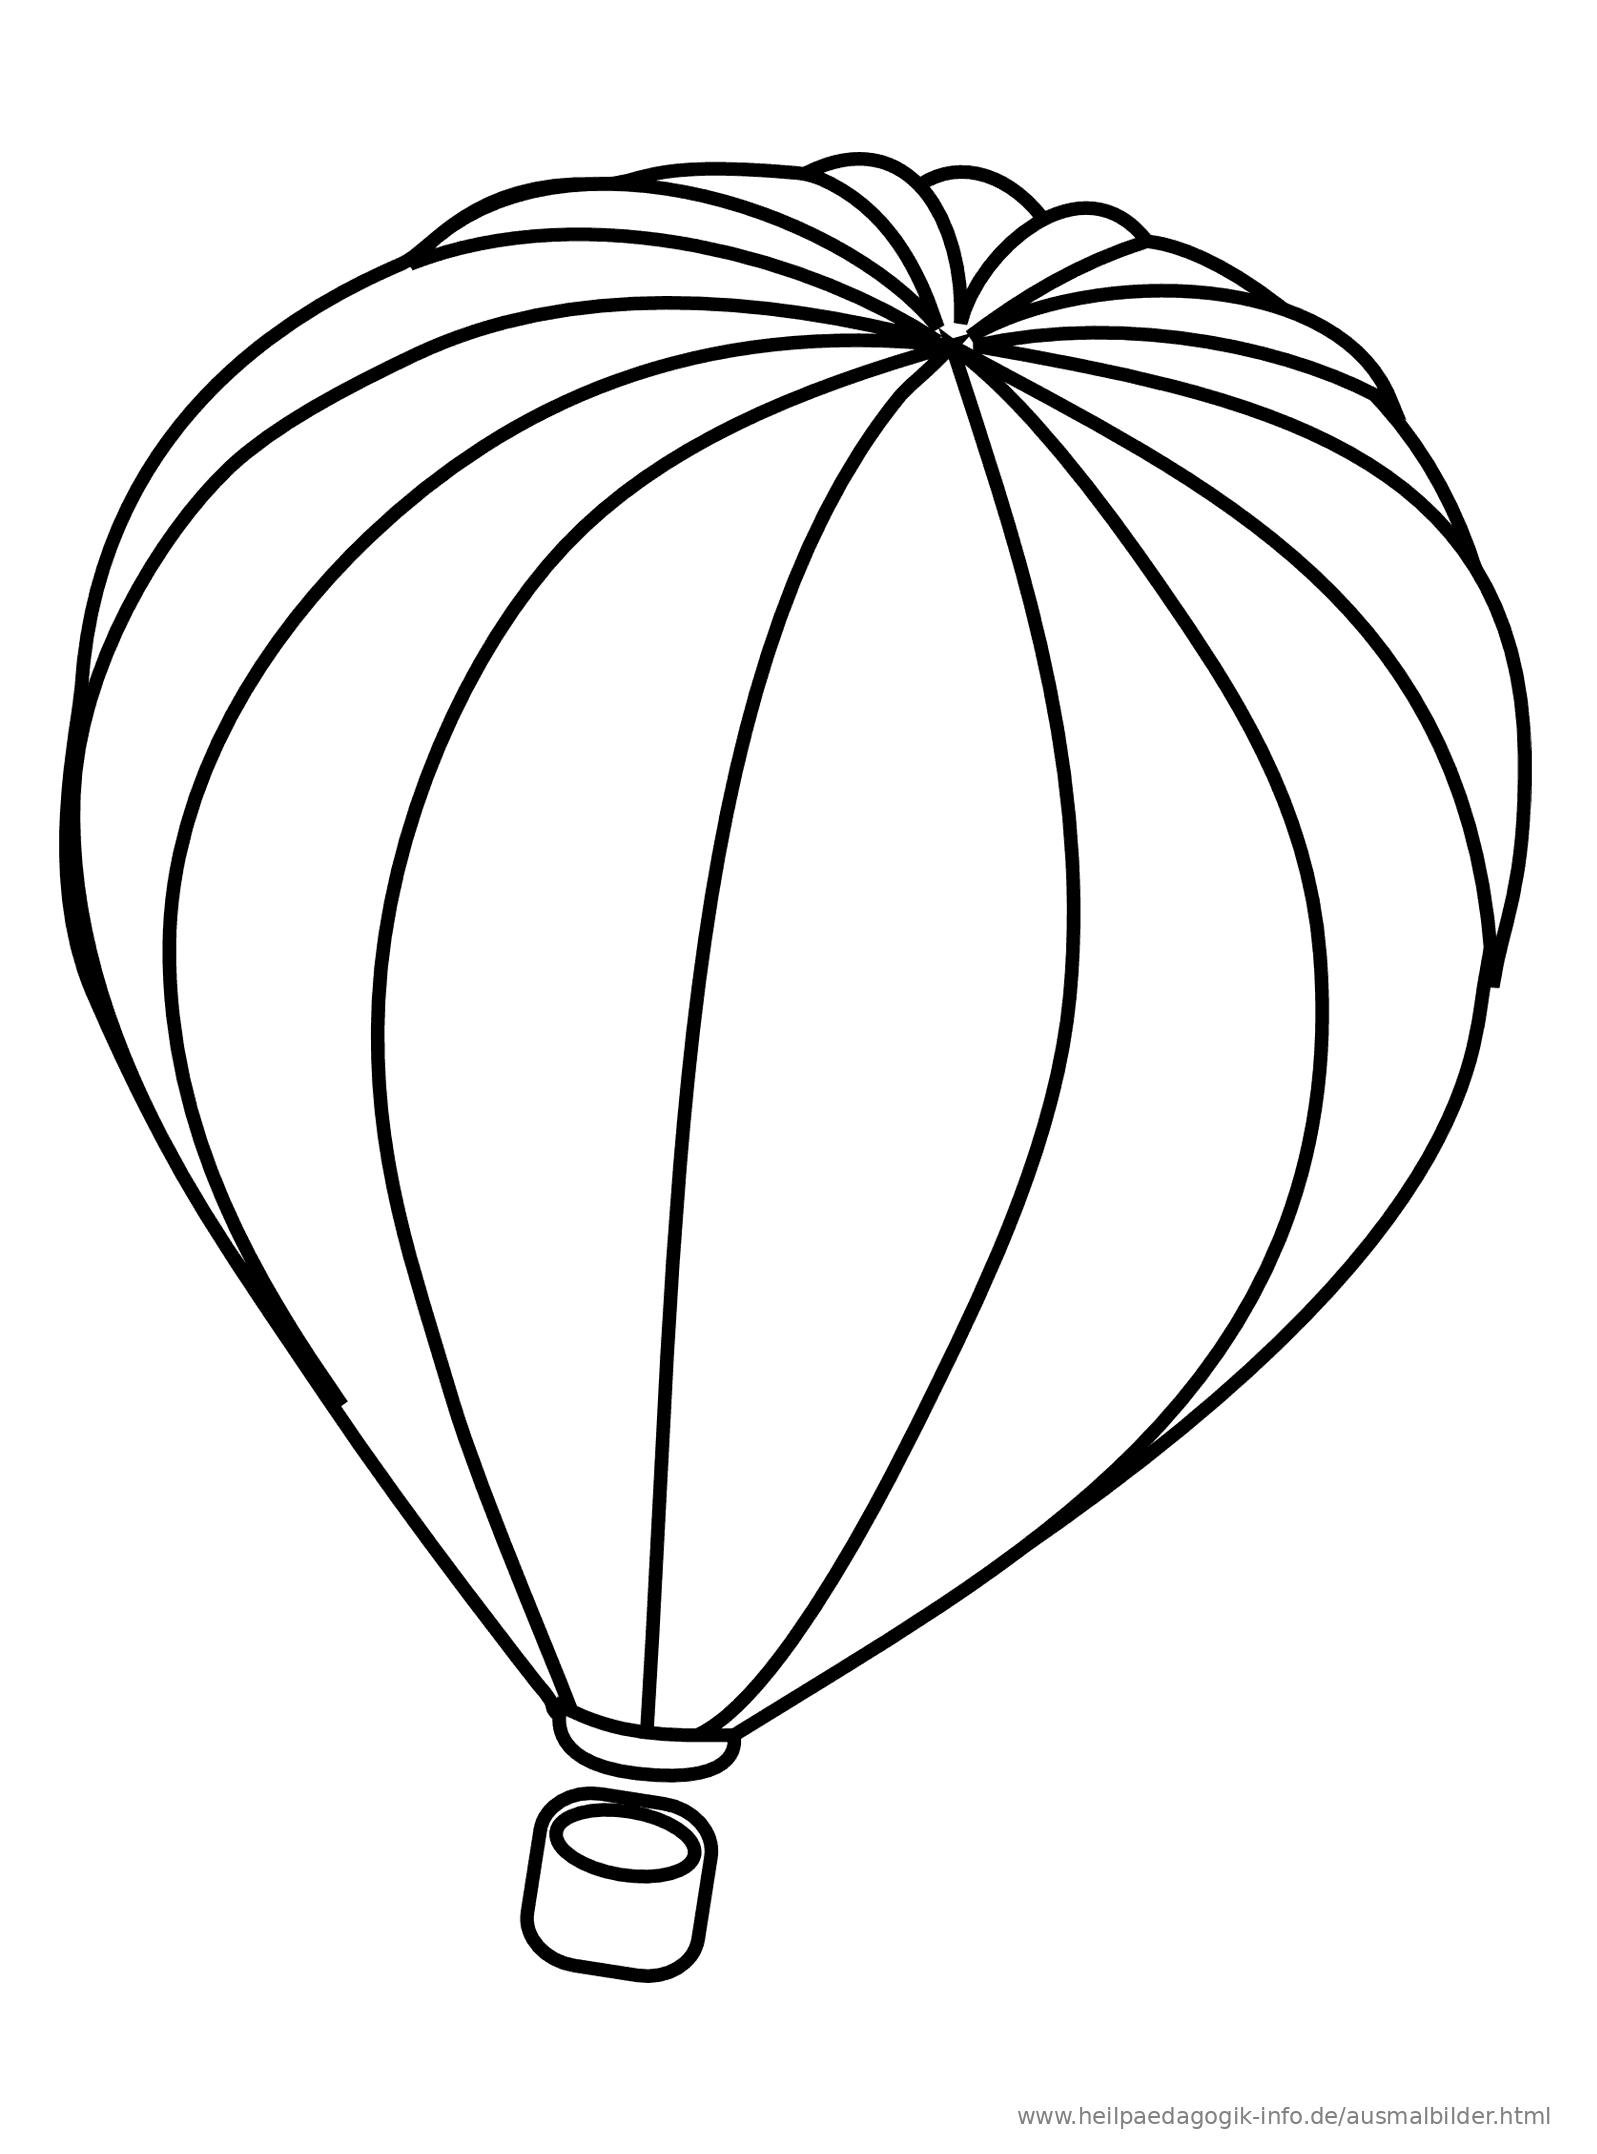 Ausmalbilder Heißluftballons